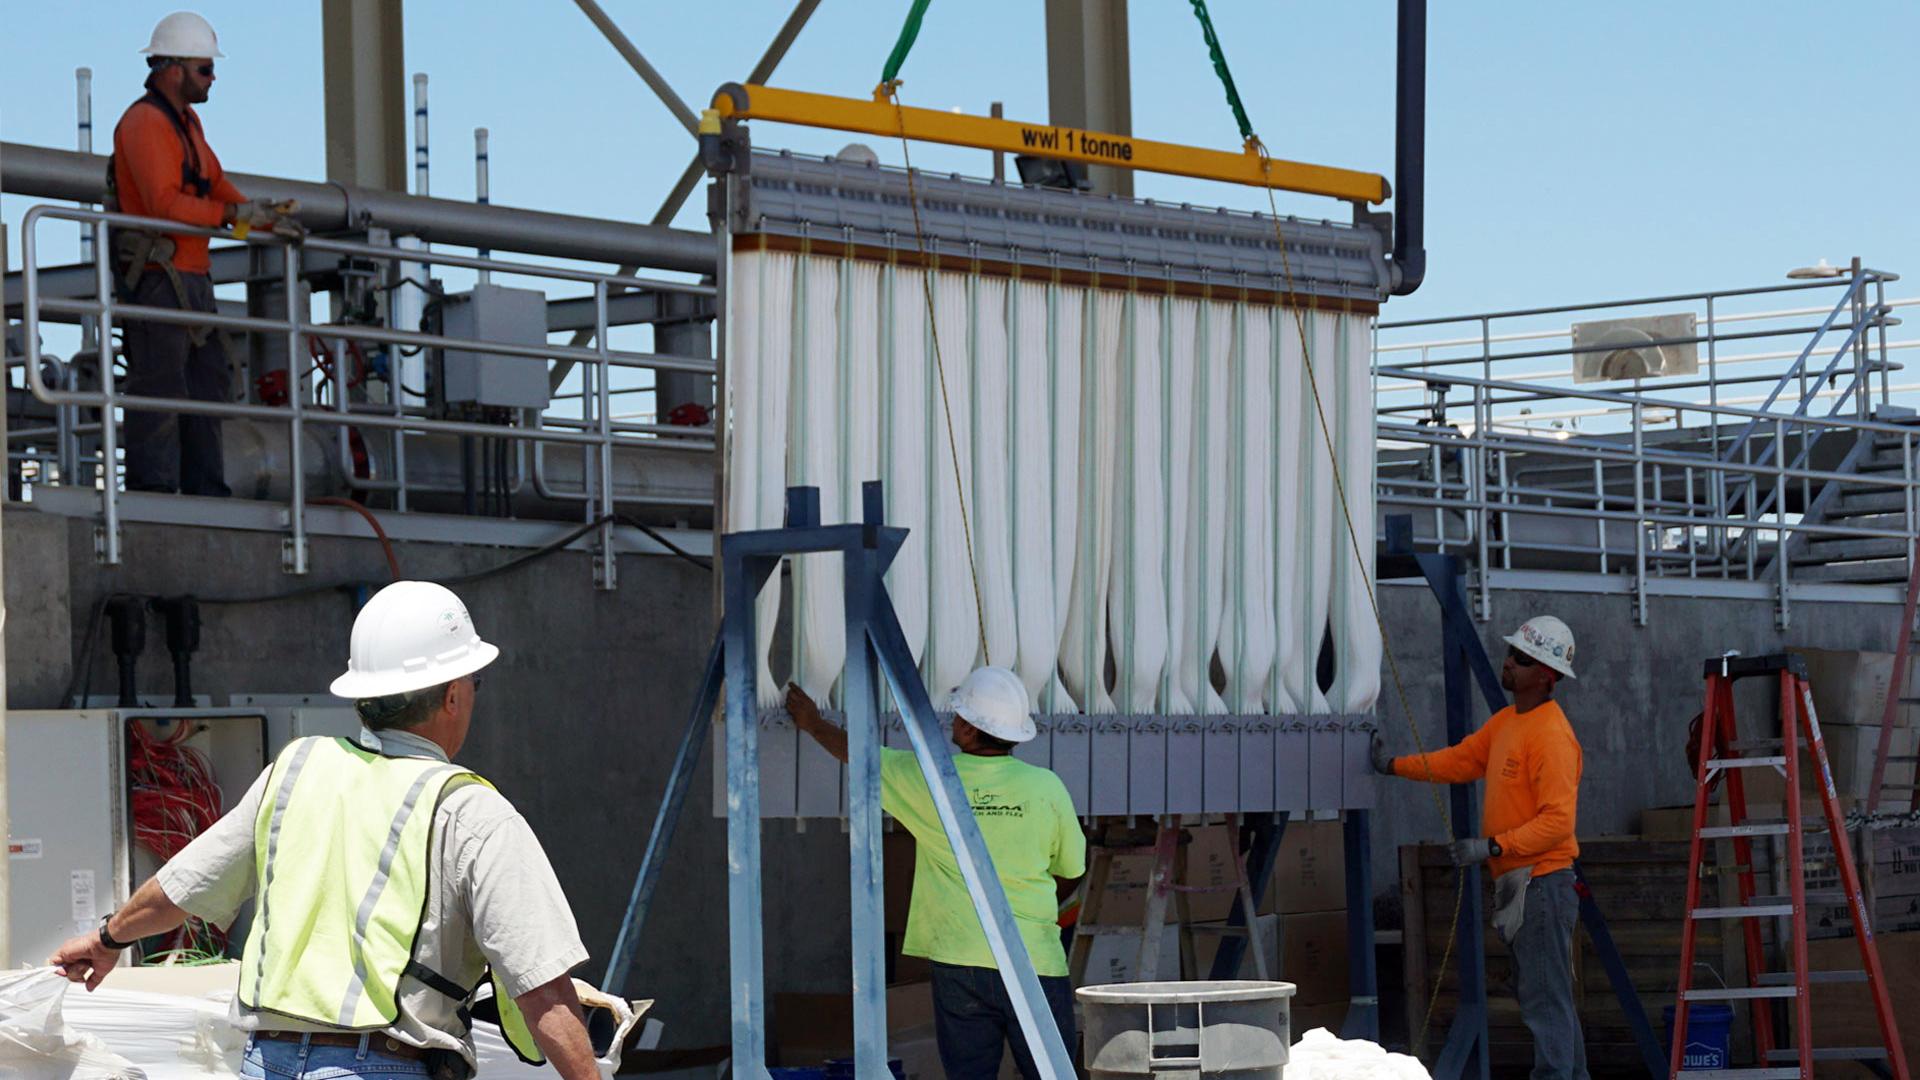 Drought Stricken California Farmers Look To Tap Urban Wastewater Wbur News